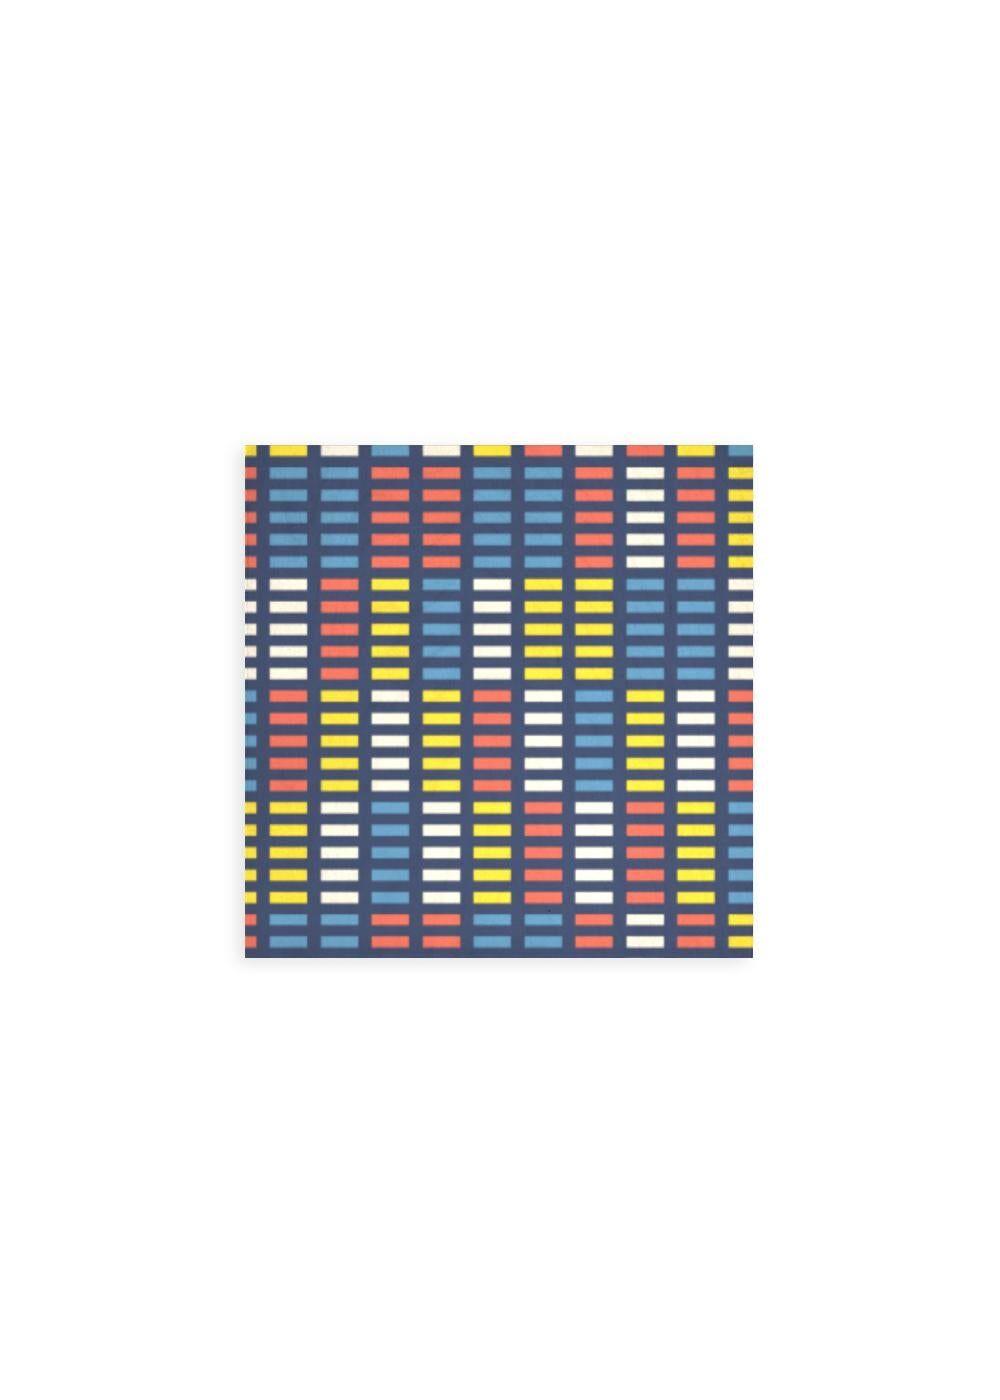 VIDA Wood Wall Art - 12x12 - Retro Music Equalizer by VIDA Original Artist  - Size: Small